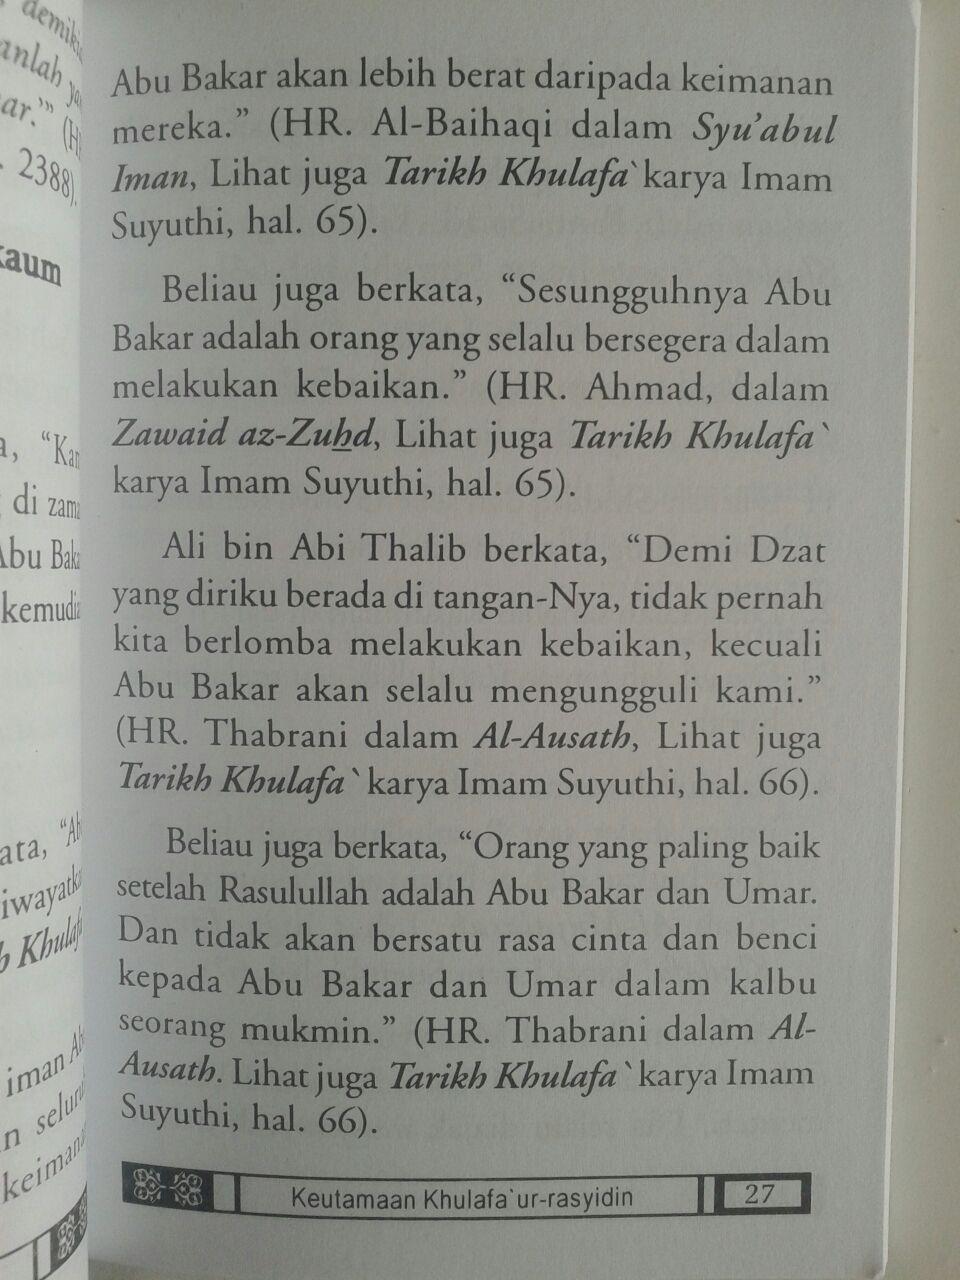 Buku Saku Keutamaan Khulafaur Rasyidin Dan Umar bin Abdul Aziz isi 2